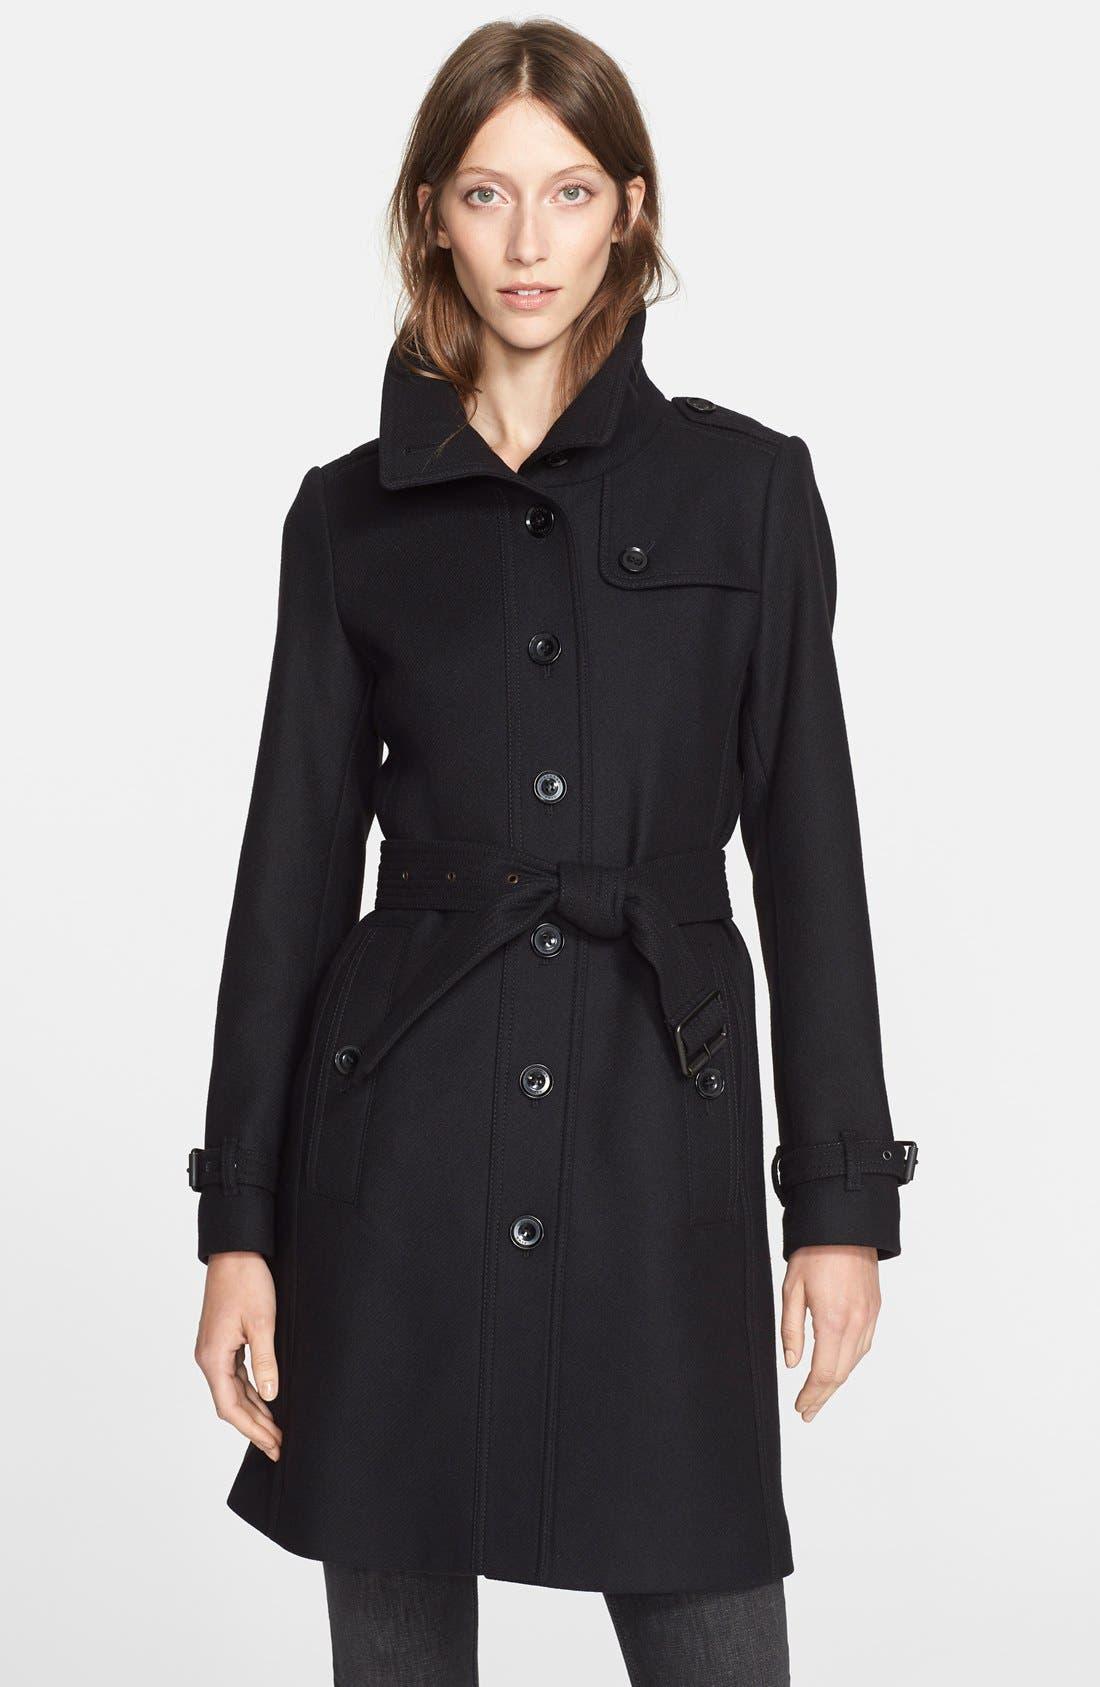 Main Image - Burberry Brit 'Rushfield' Wool Blend Single Breasted Coat